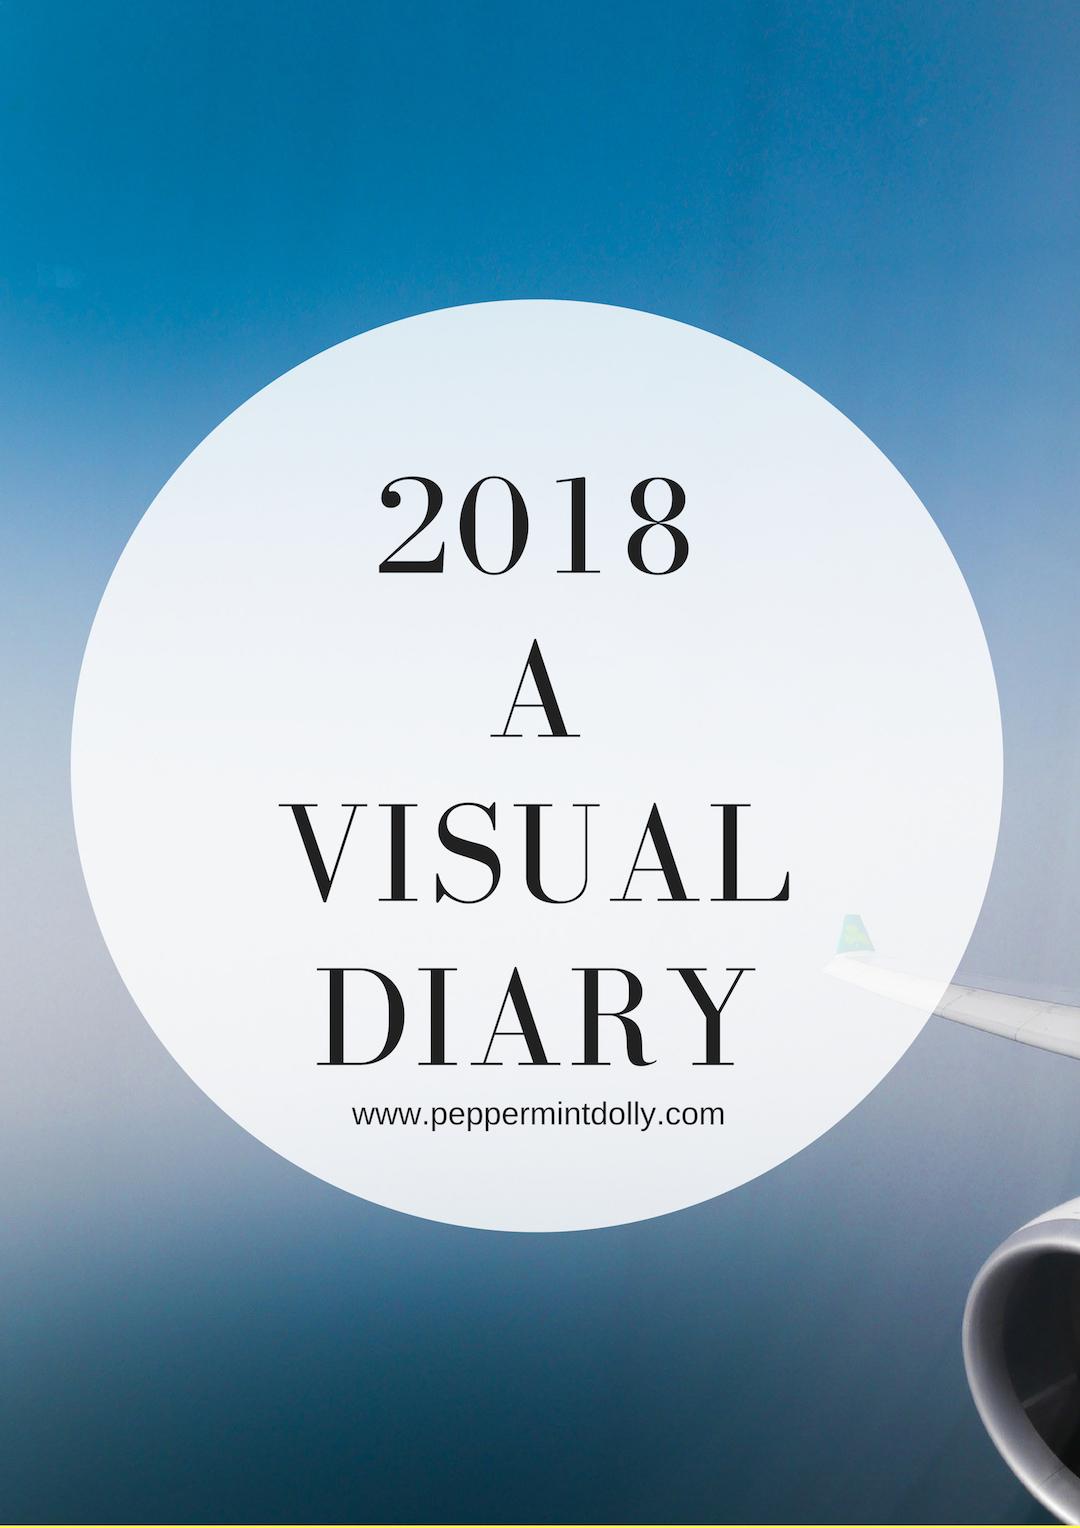 2018 A Visual Diary